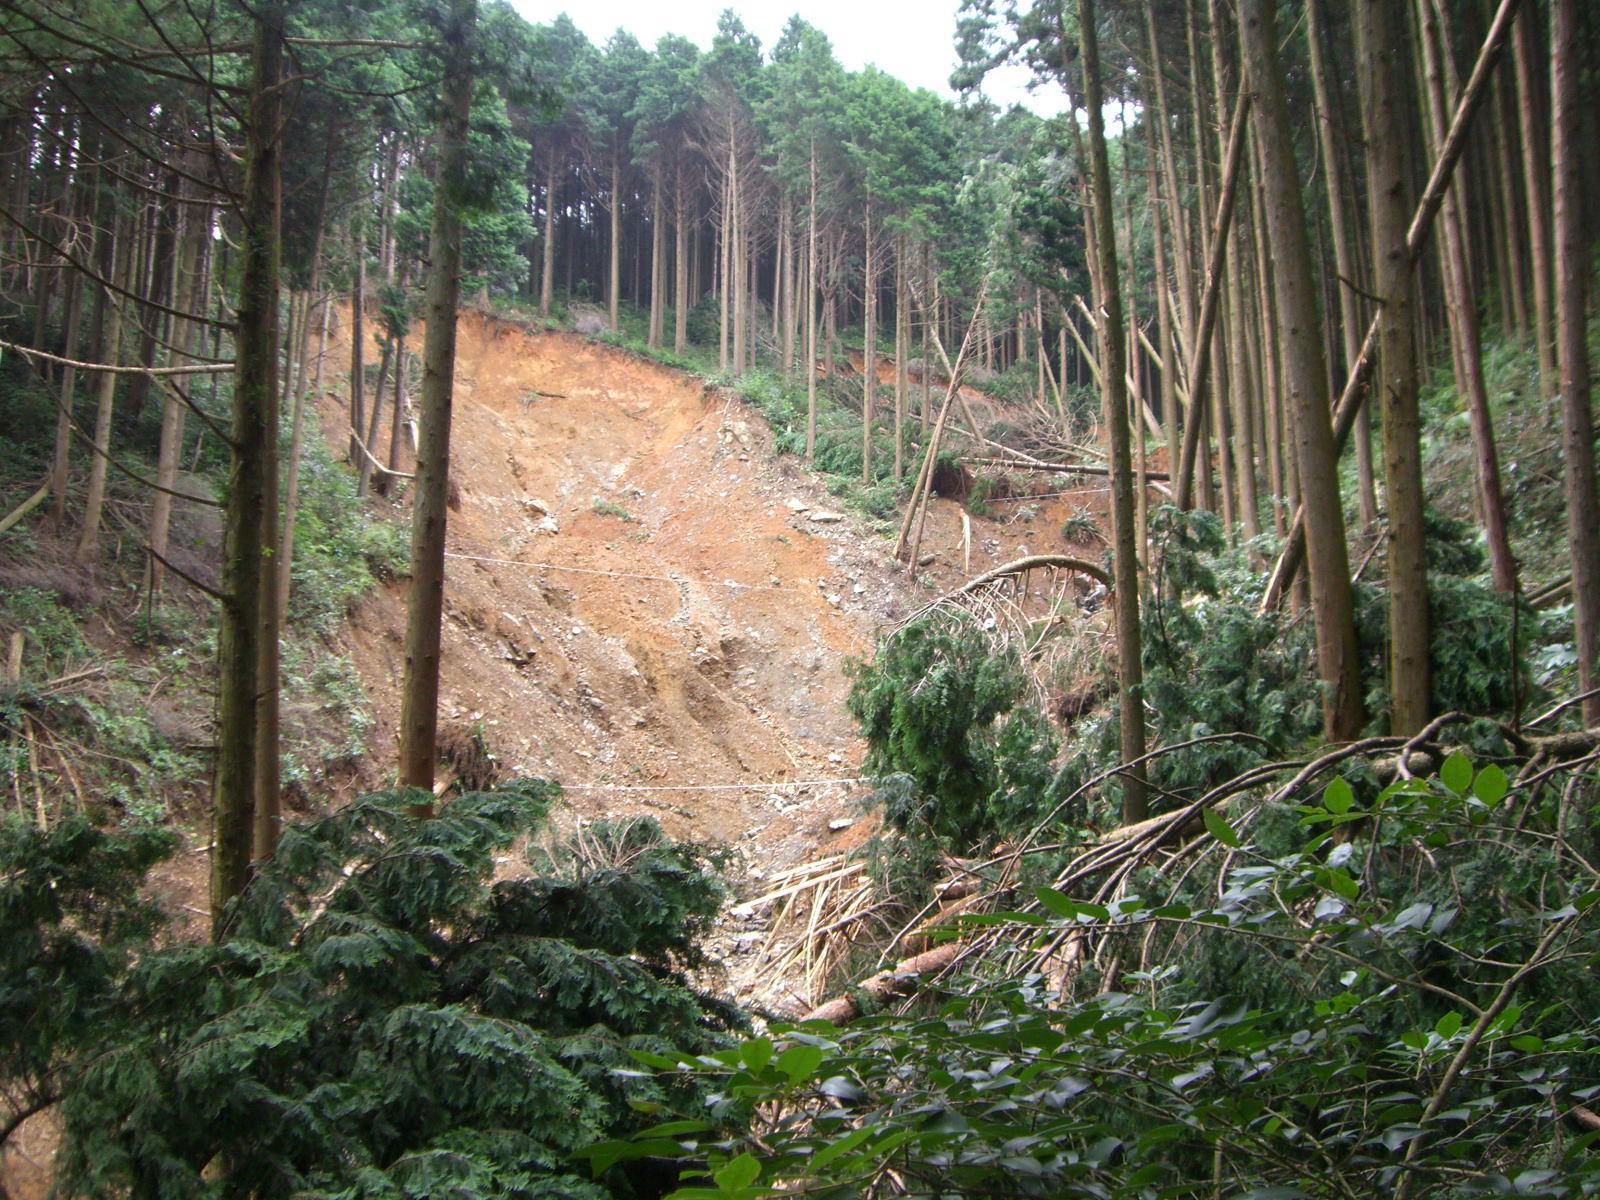 公務員林業の弊害 : 福岡県篠栗町の土砂災害は人災